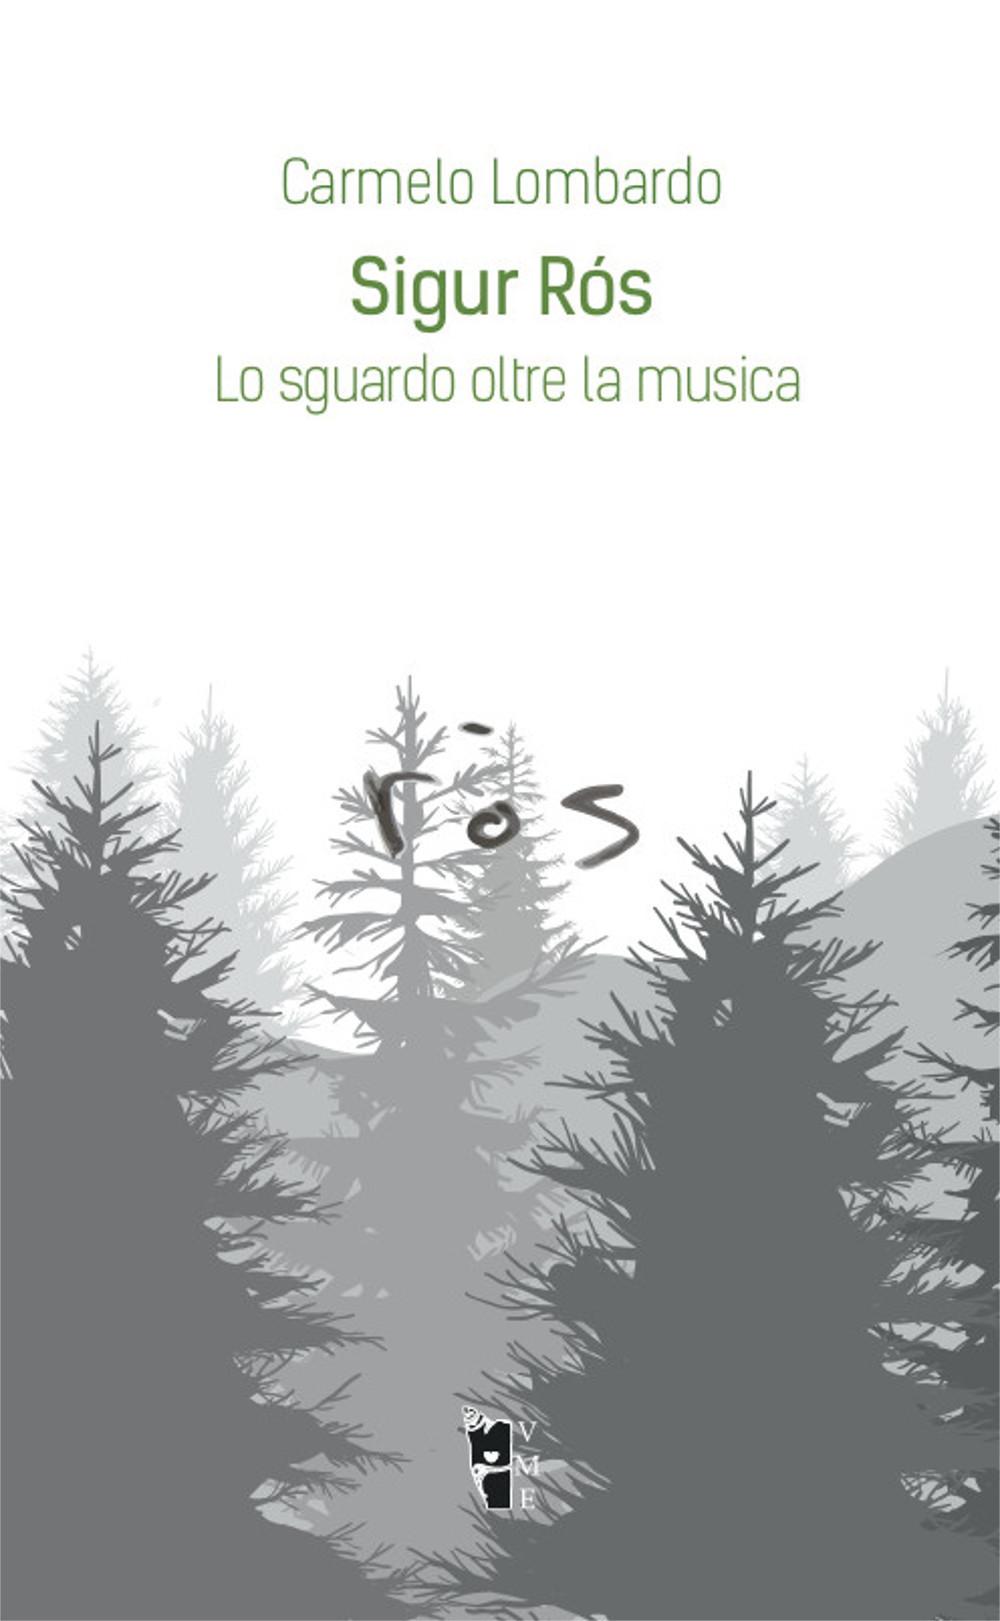 Carmelo Lombardo - Sigur Rós. Lo sguardo oltre la musica 9788894898002